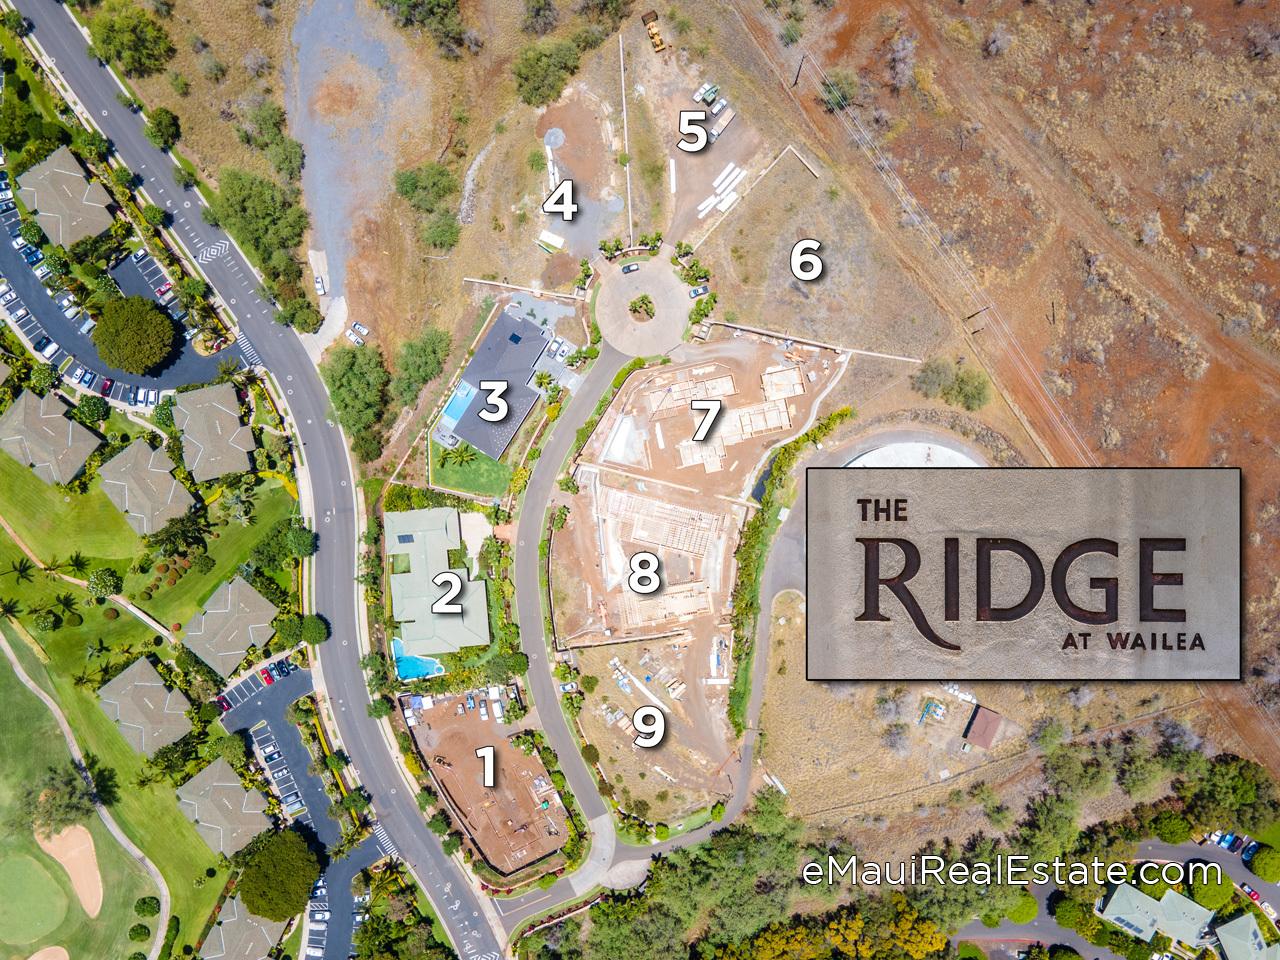 The Ridge at Wailea map